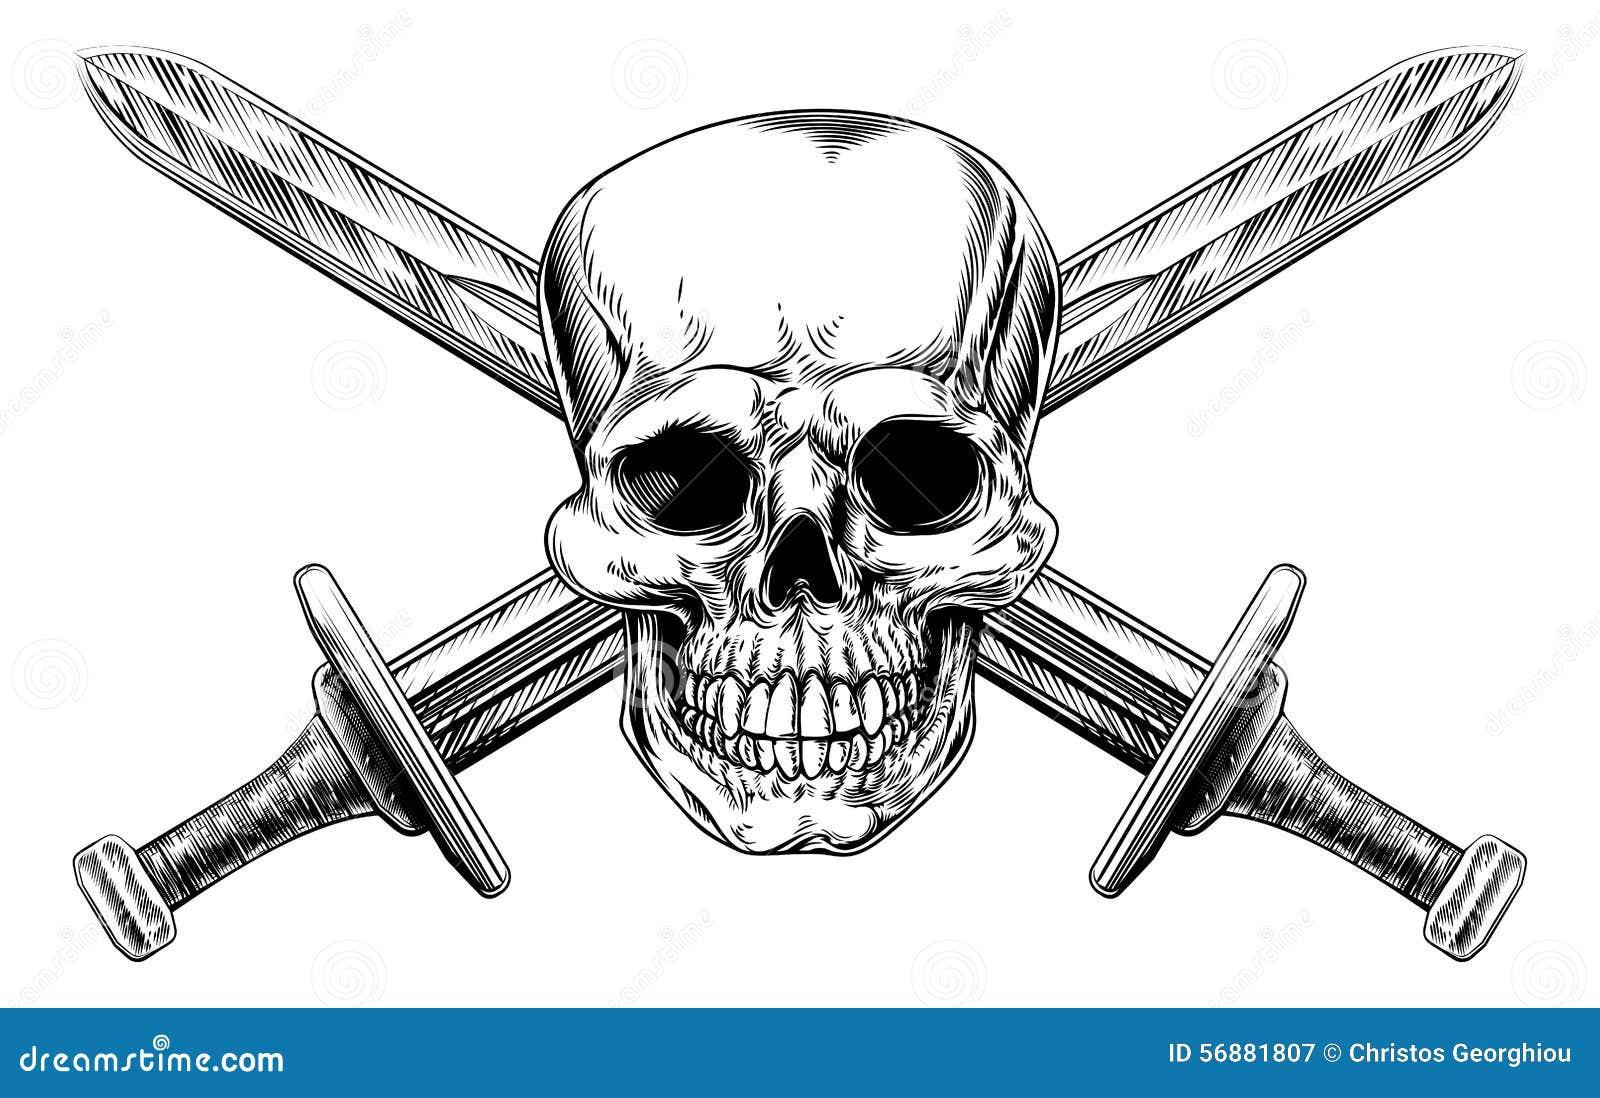 Skull cross swords stock vector image 56881807 for Crossed swords tattoo